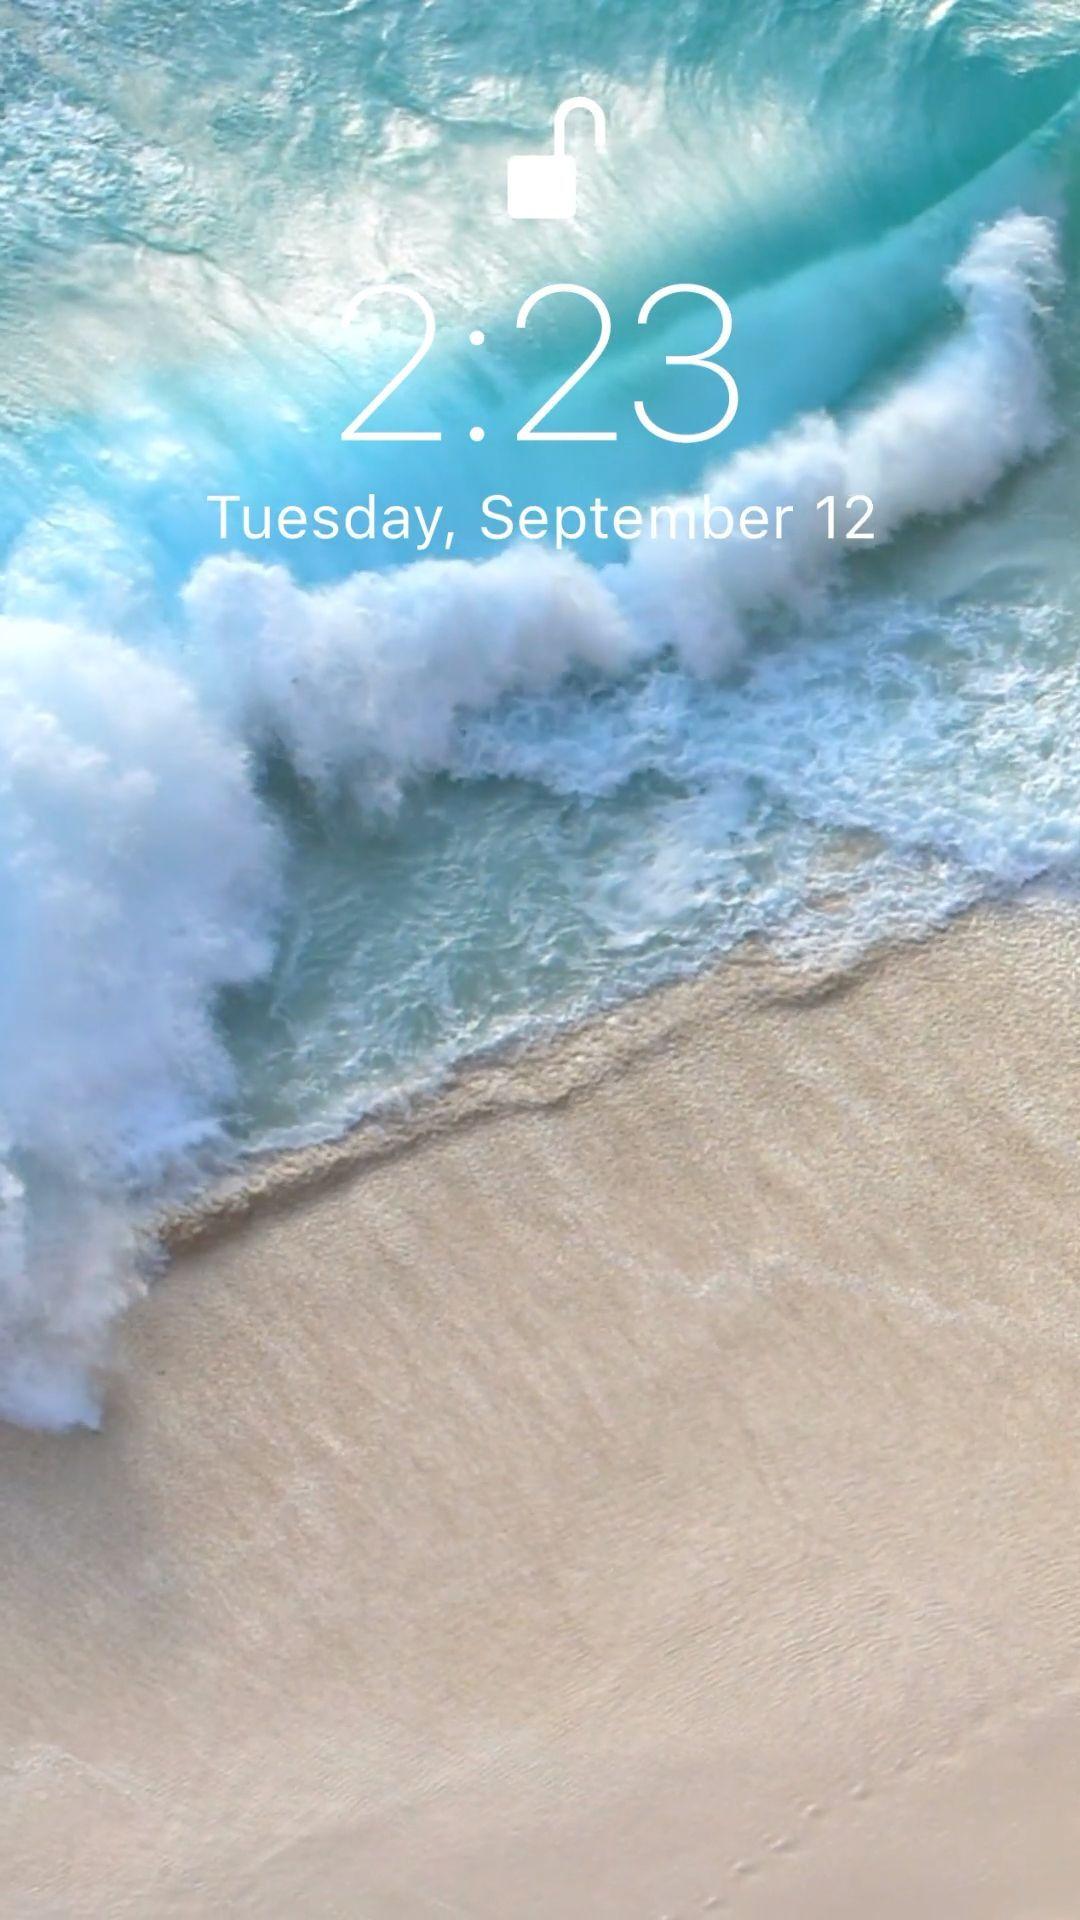 Ocean Wallpaper Iphonewallpaper Ocean Wallpaper Iphone Wallpaper Video Iphone Lockscreen Wallpaper